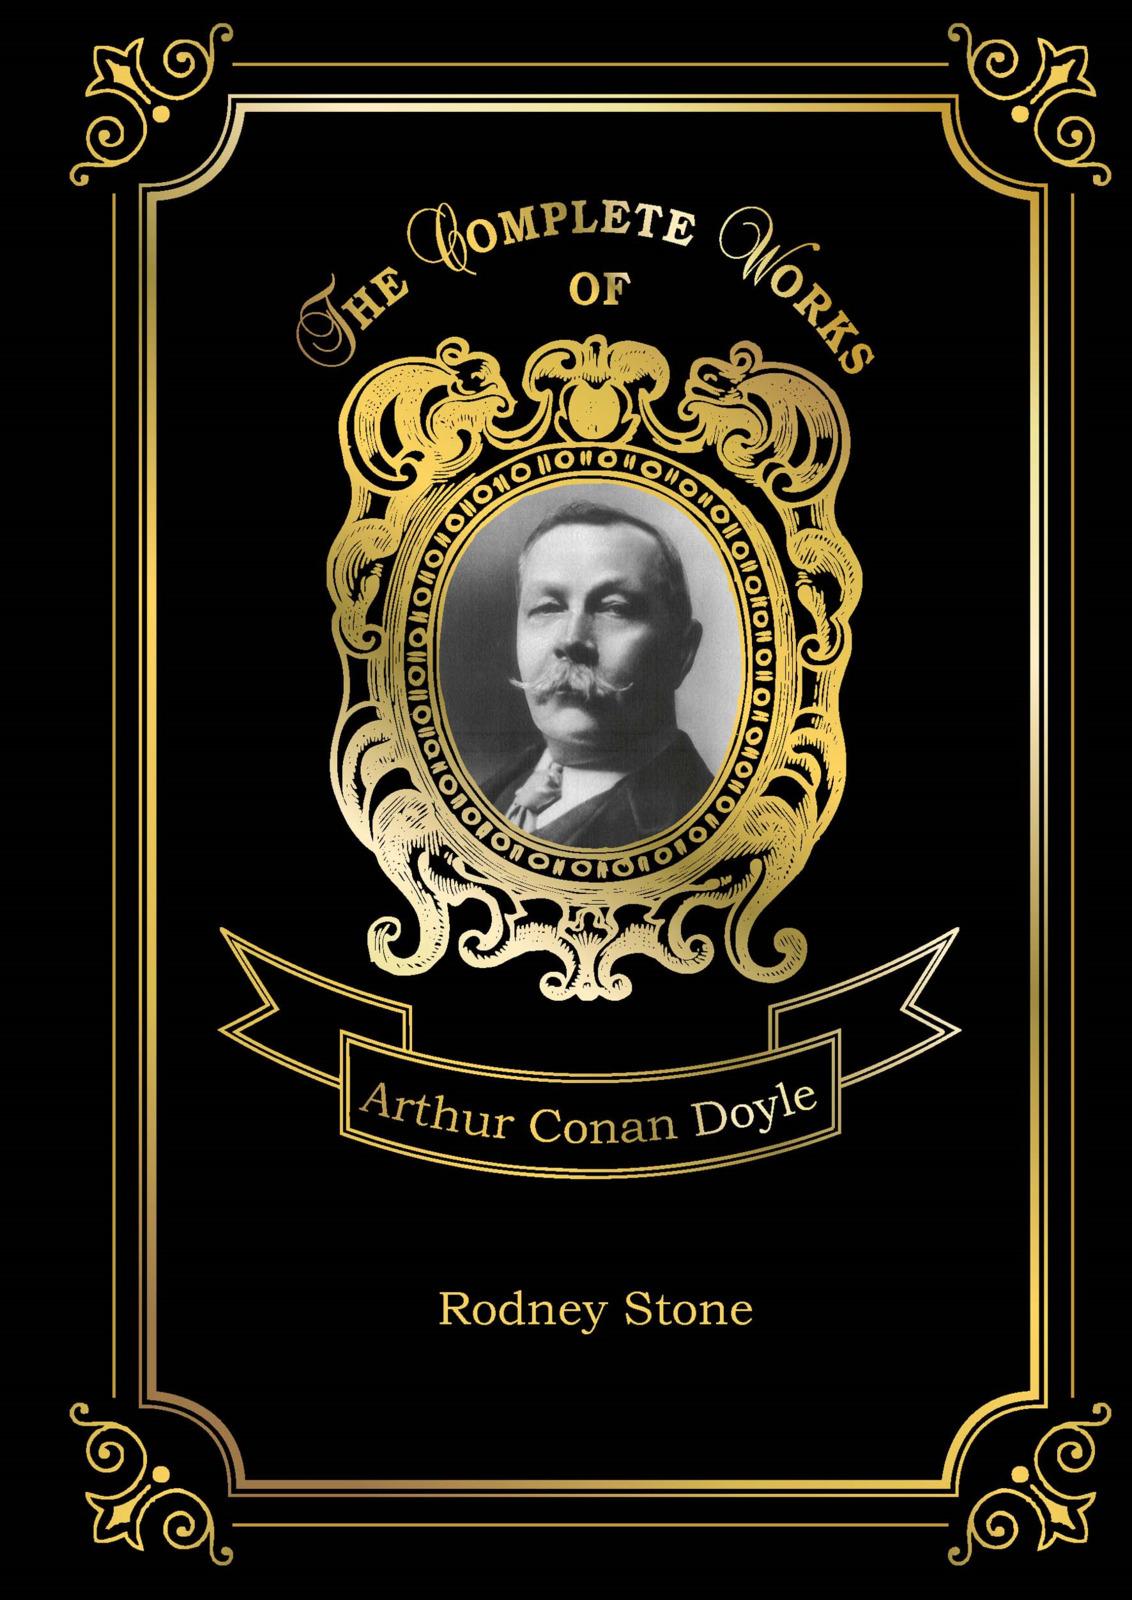 Arthur Conan Doyle Rodney Stone doyle arthur conan rodney stone a novel